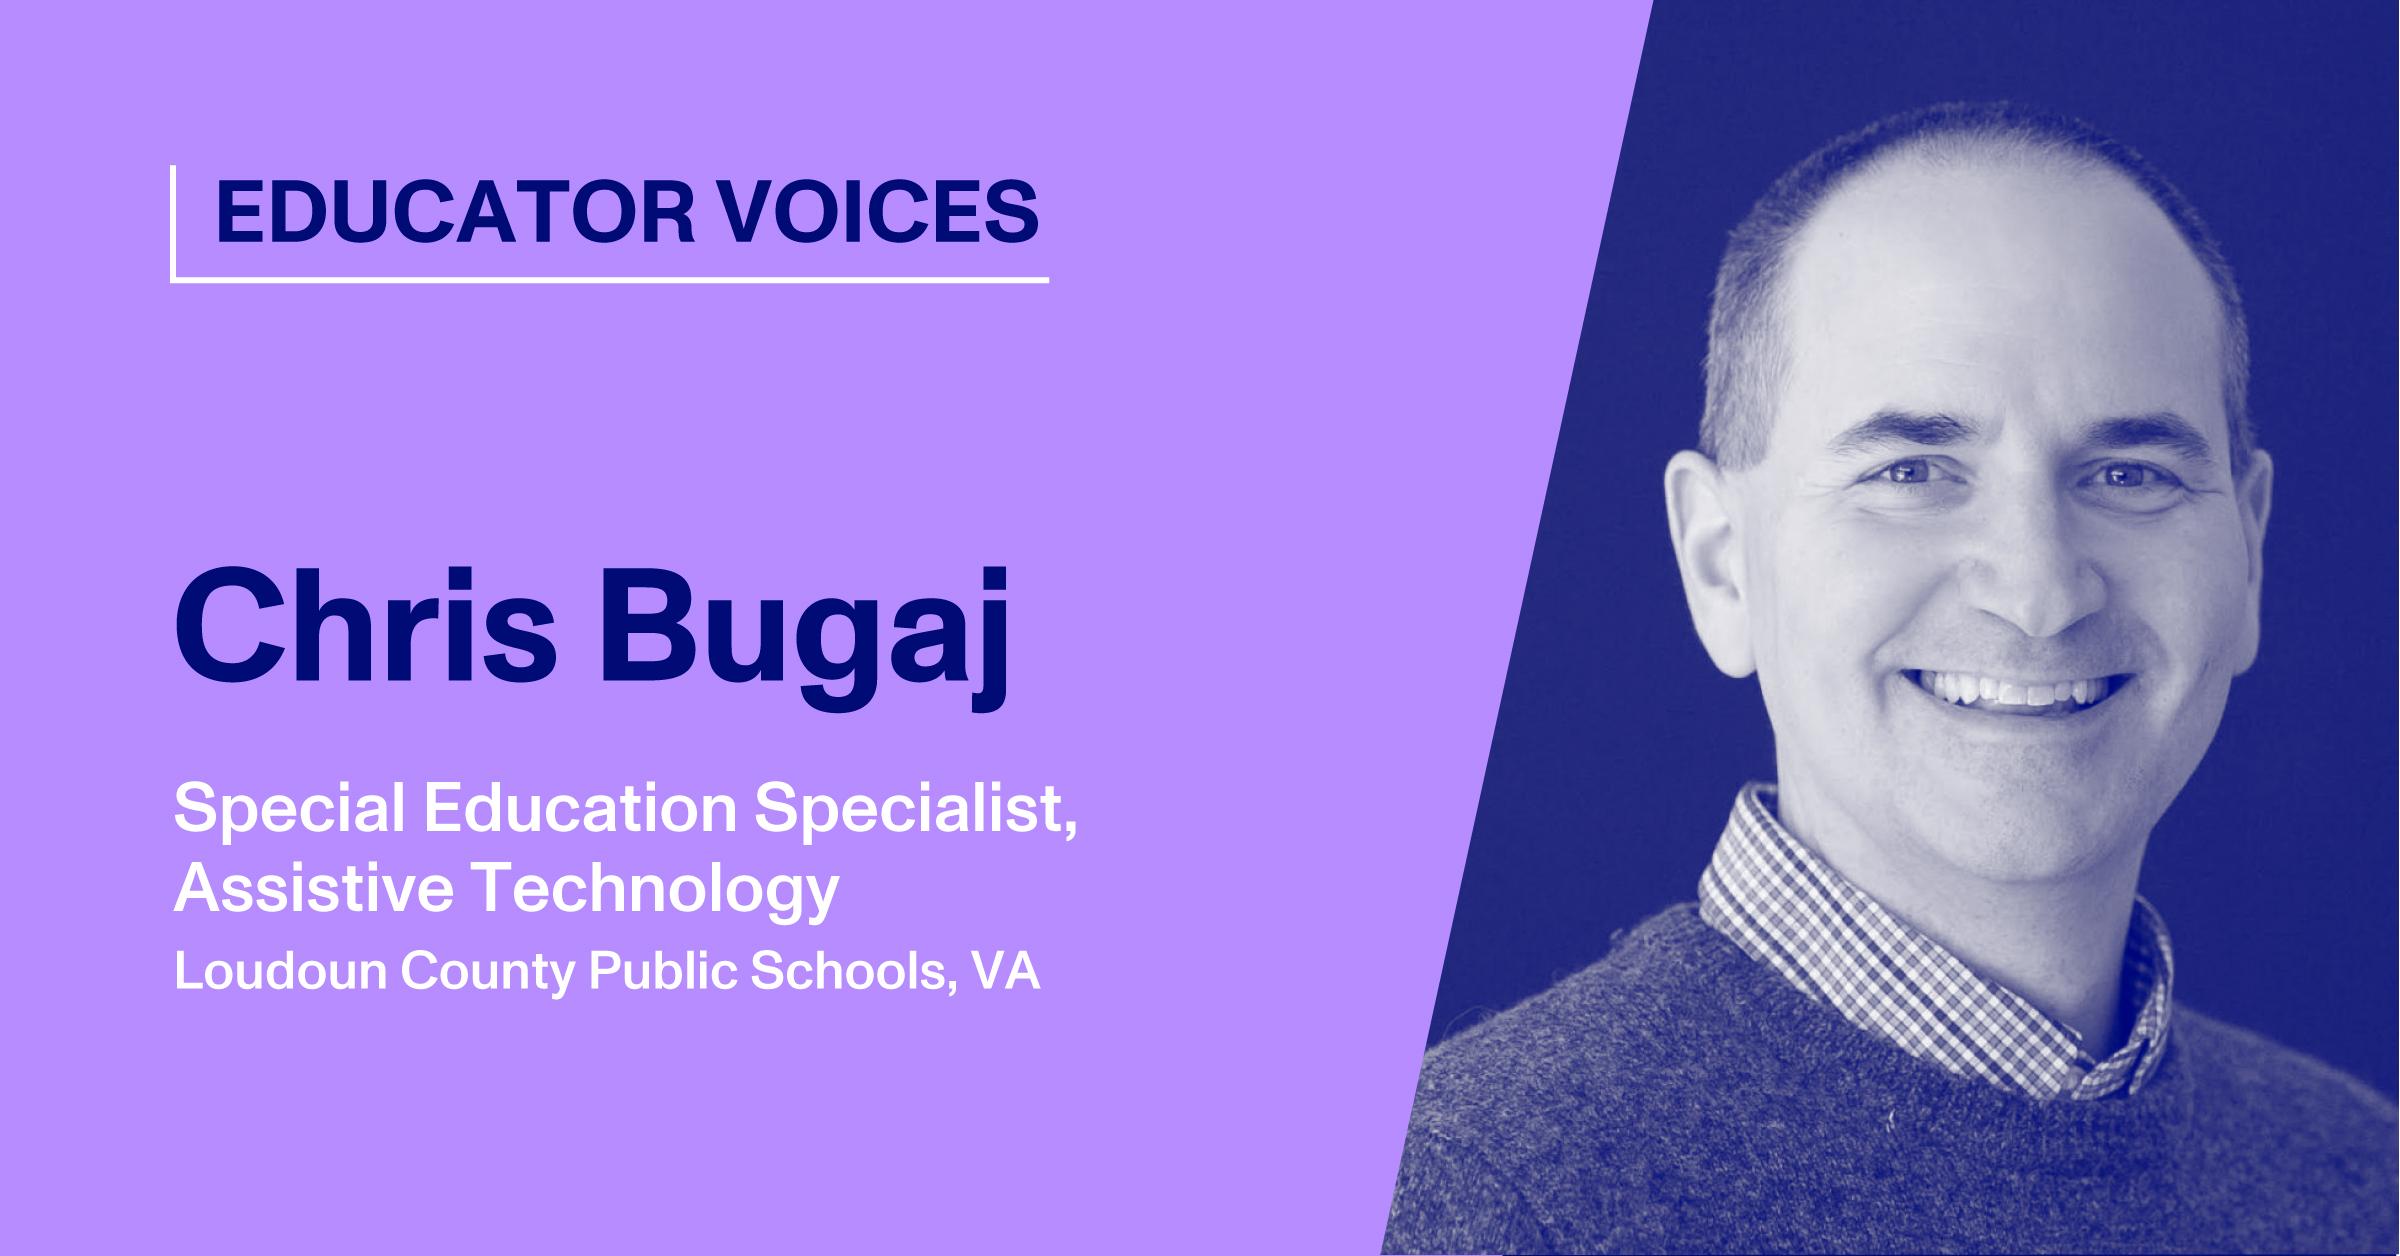 Chris Bugaj, Special Education Specialist, Assistive Technology, Loudoun County Public Schools, VA